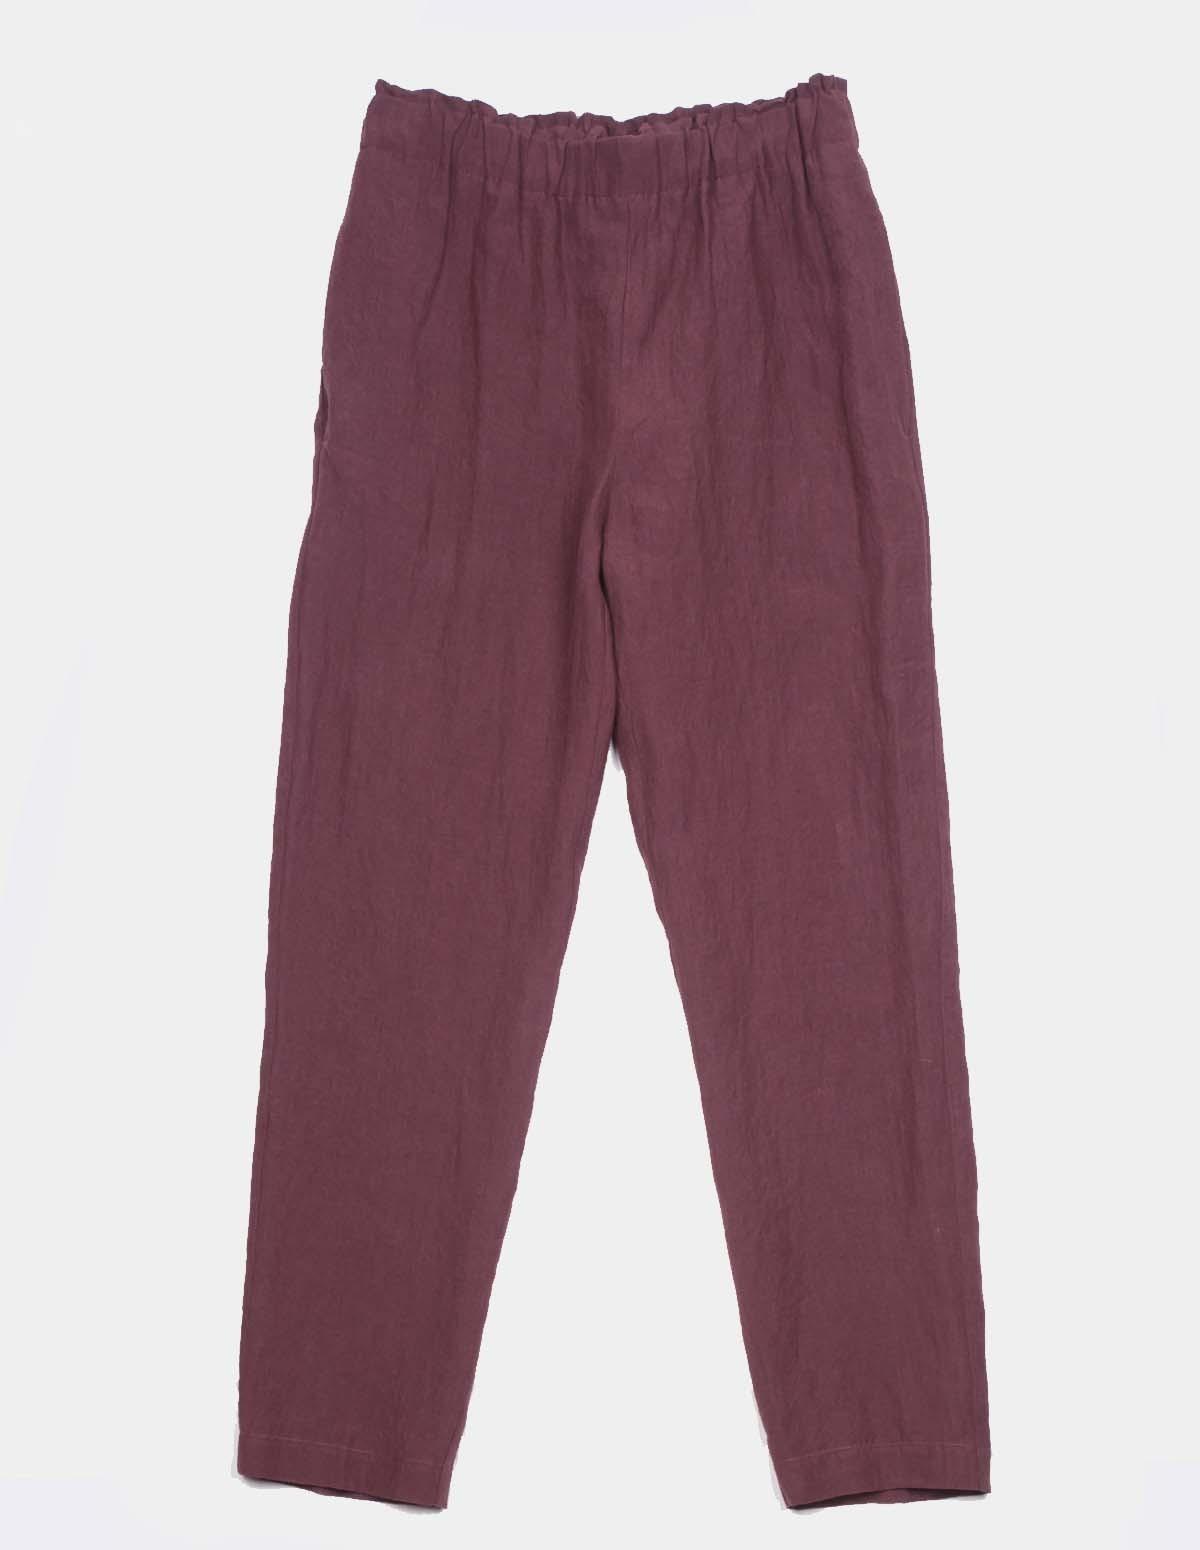 Pom 7123/50751 Pants - PRUNE 48